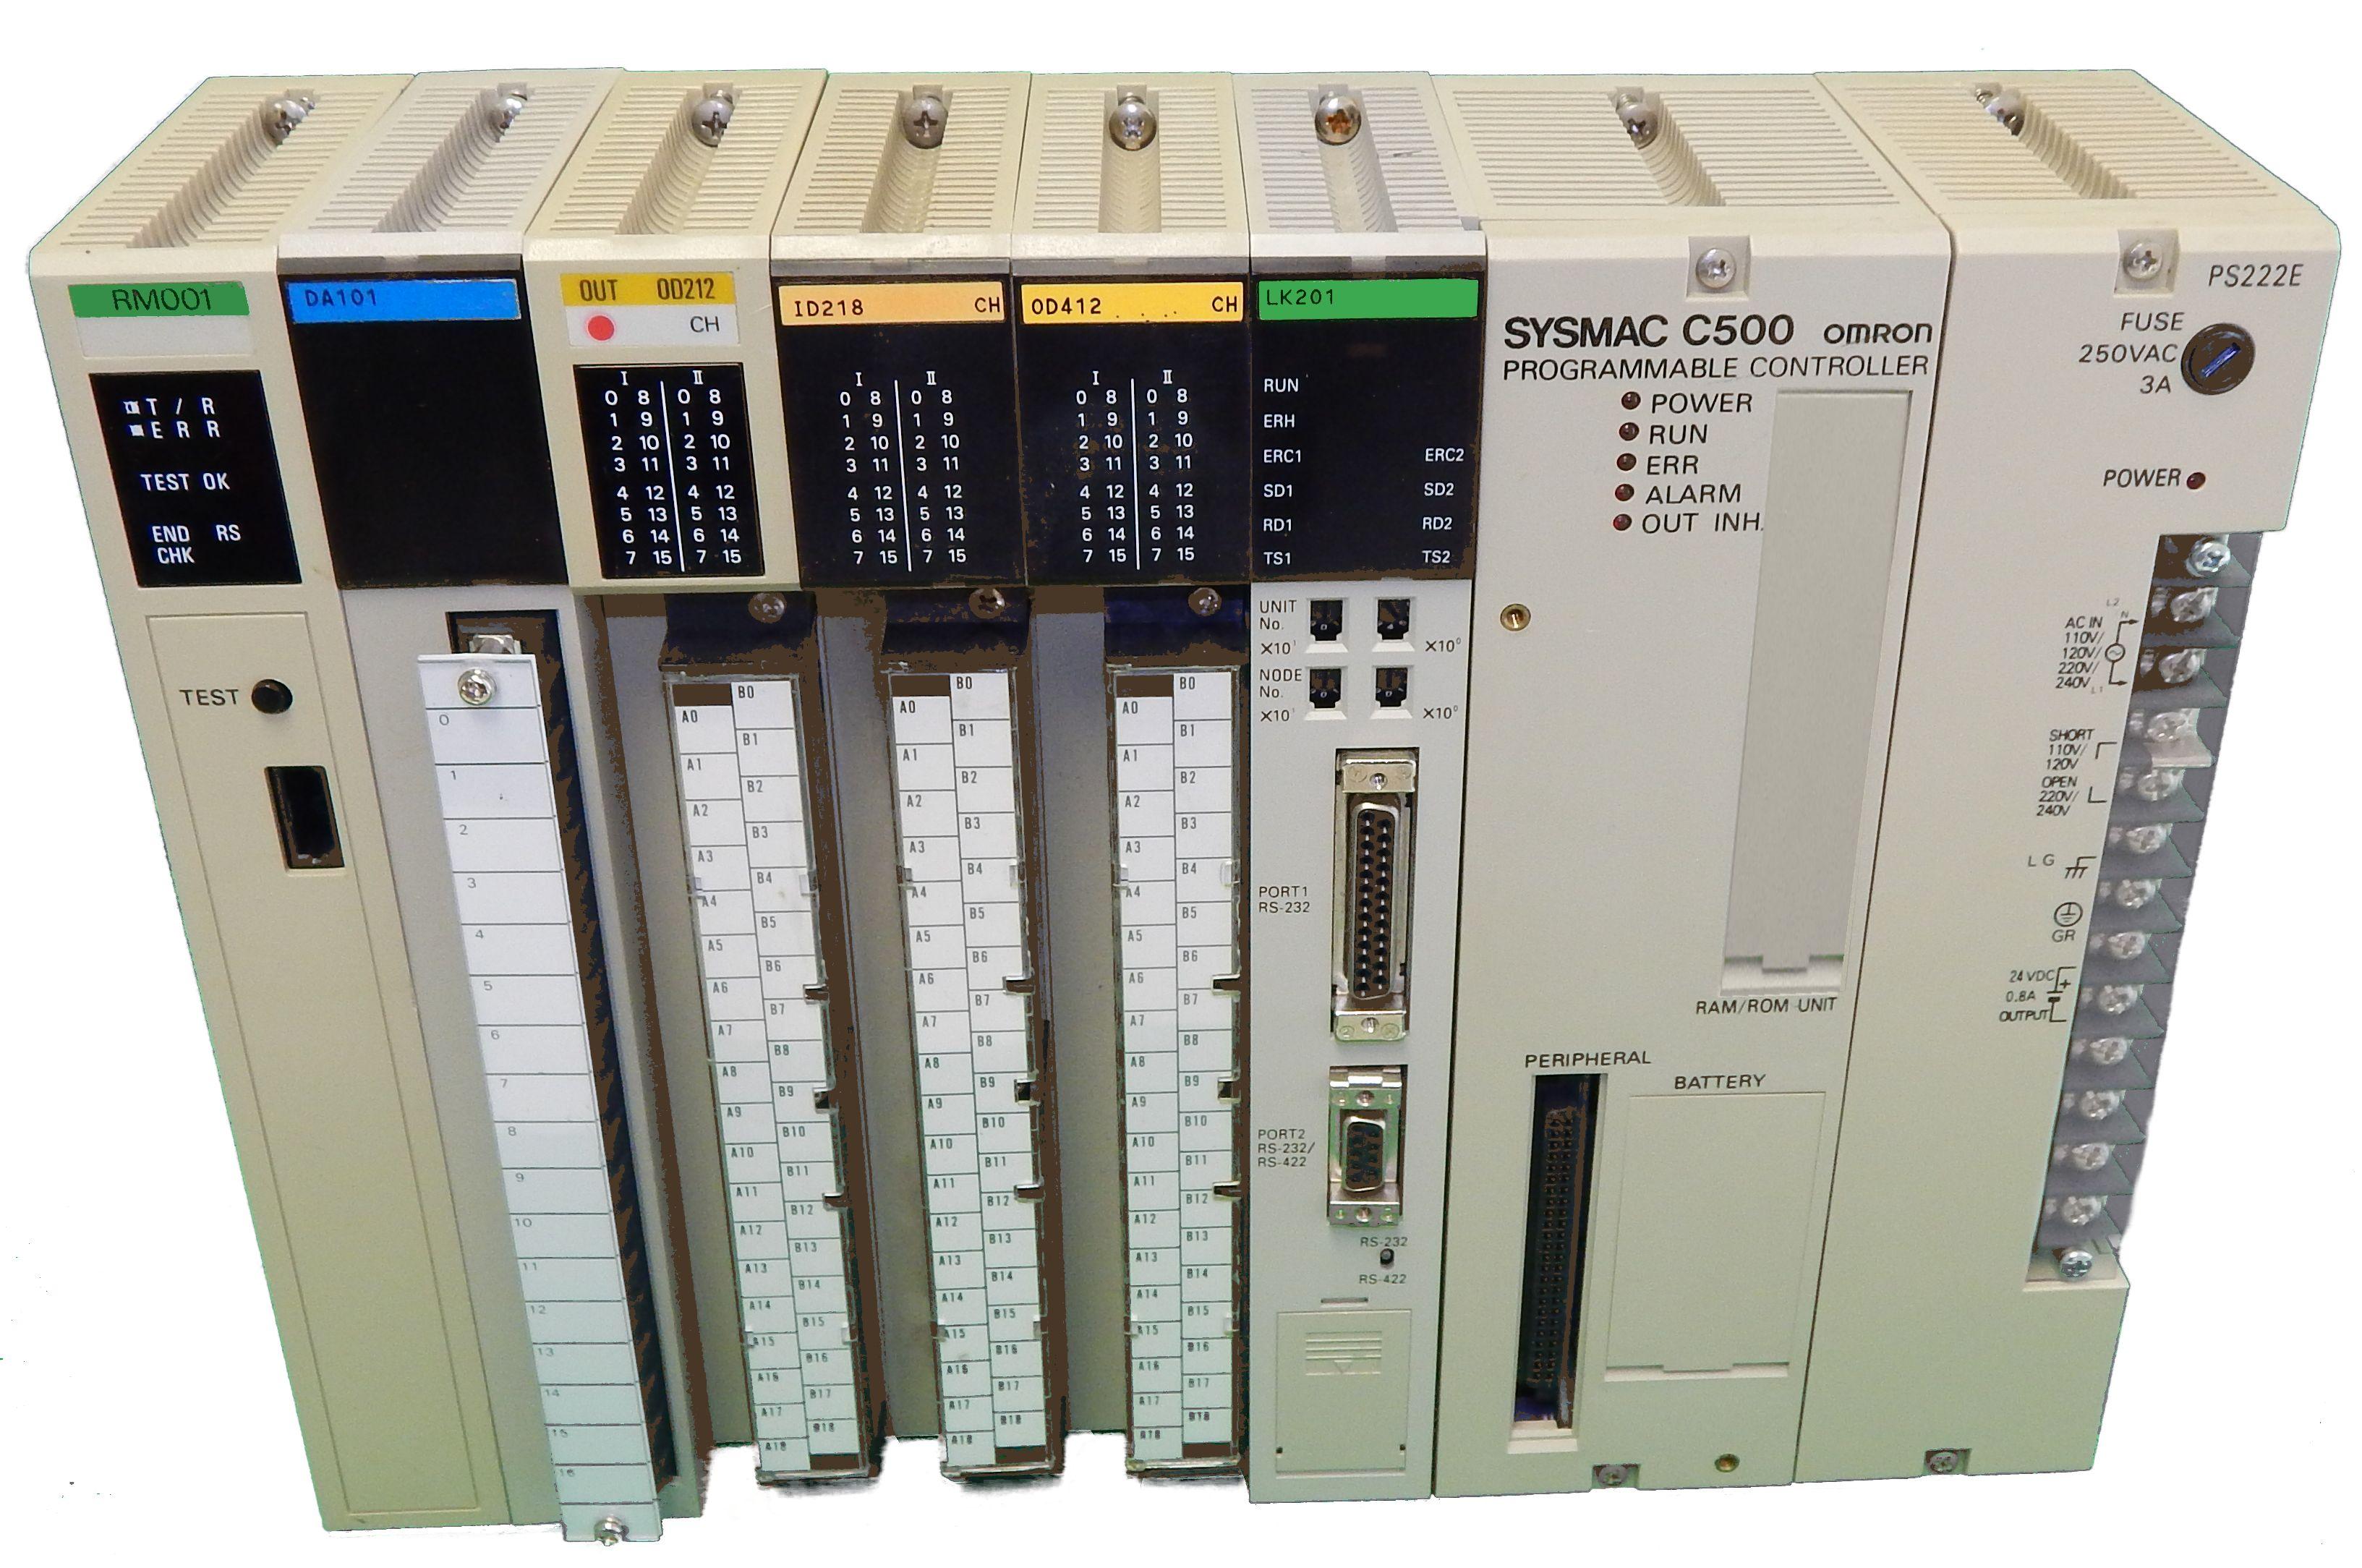 3G2C7-CPU76-E